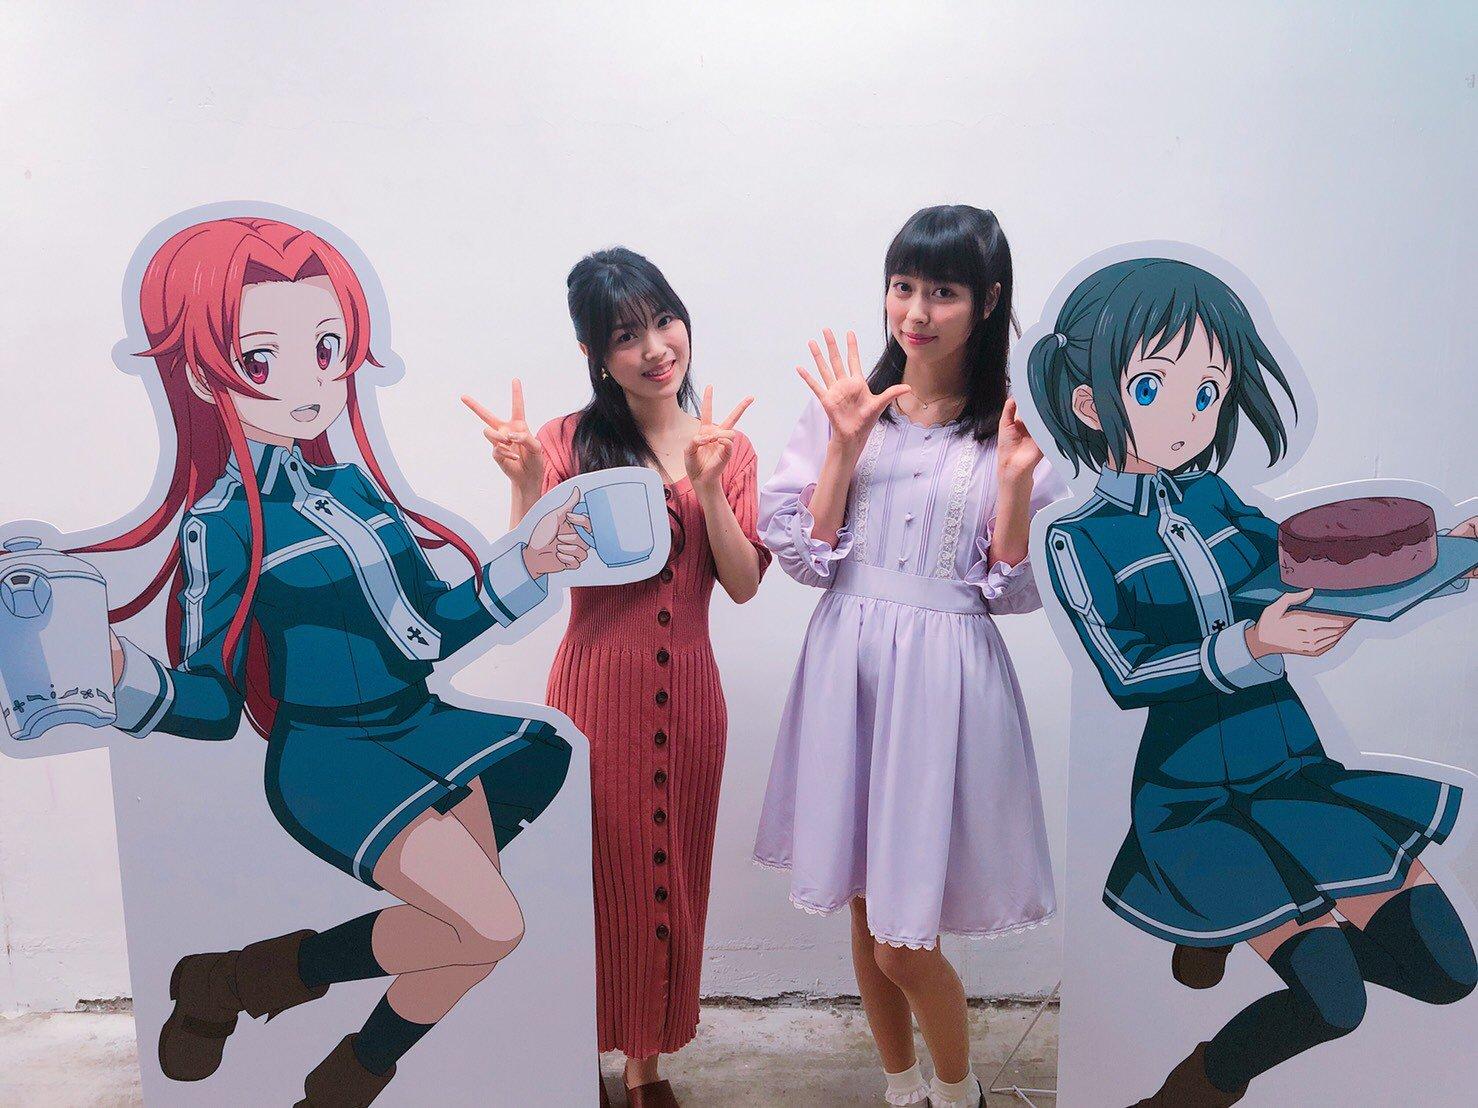 Kaori Ishihara and Reina Kondou at an event for Sword Art Online (2012)